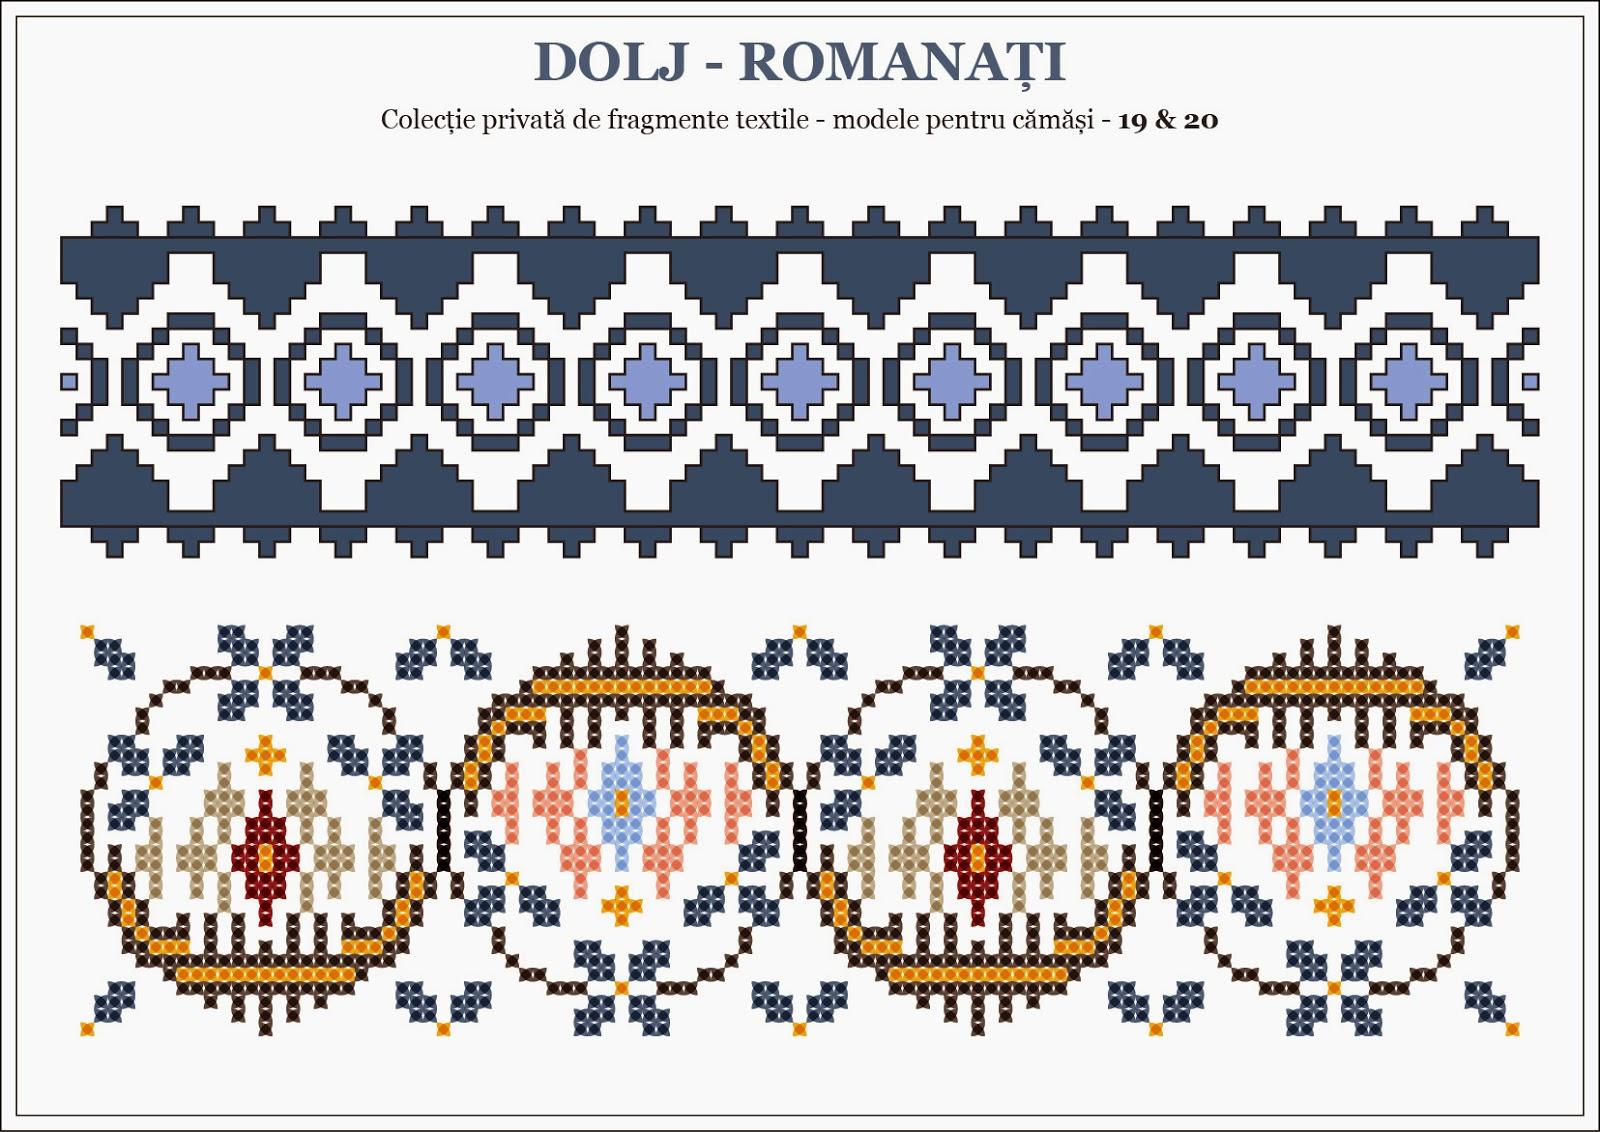 Semne Cusute Romanian Traditional Motifs Dolj Romanati Oltenia